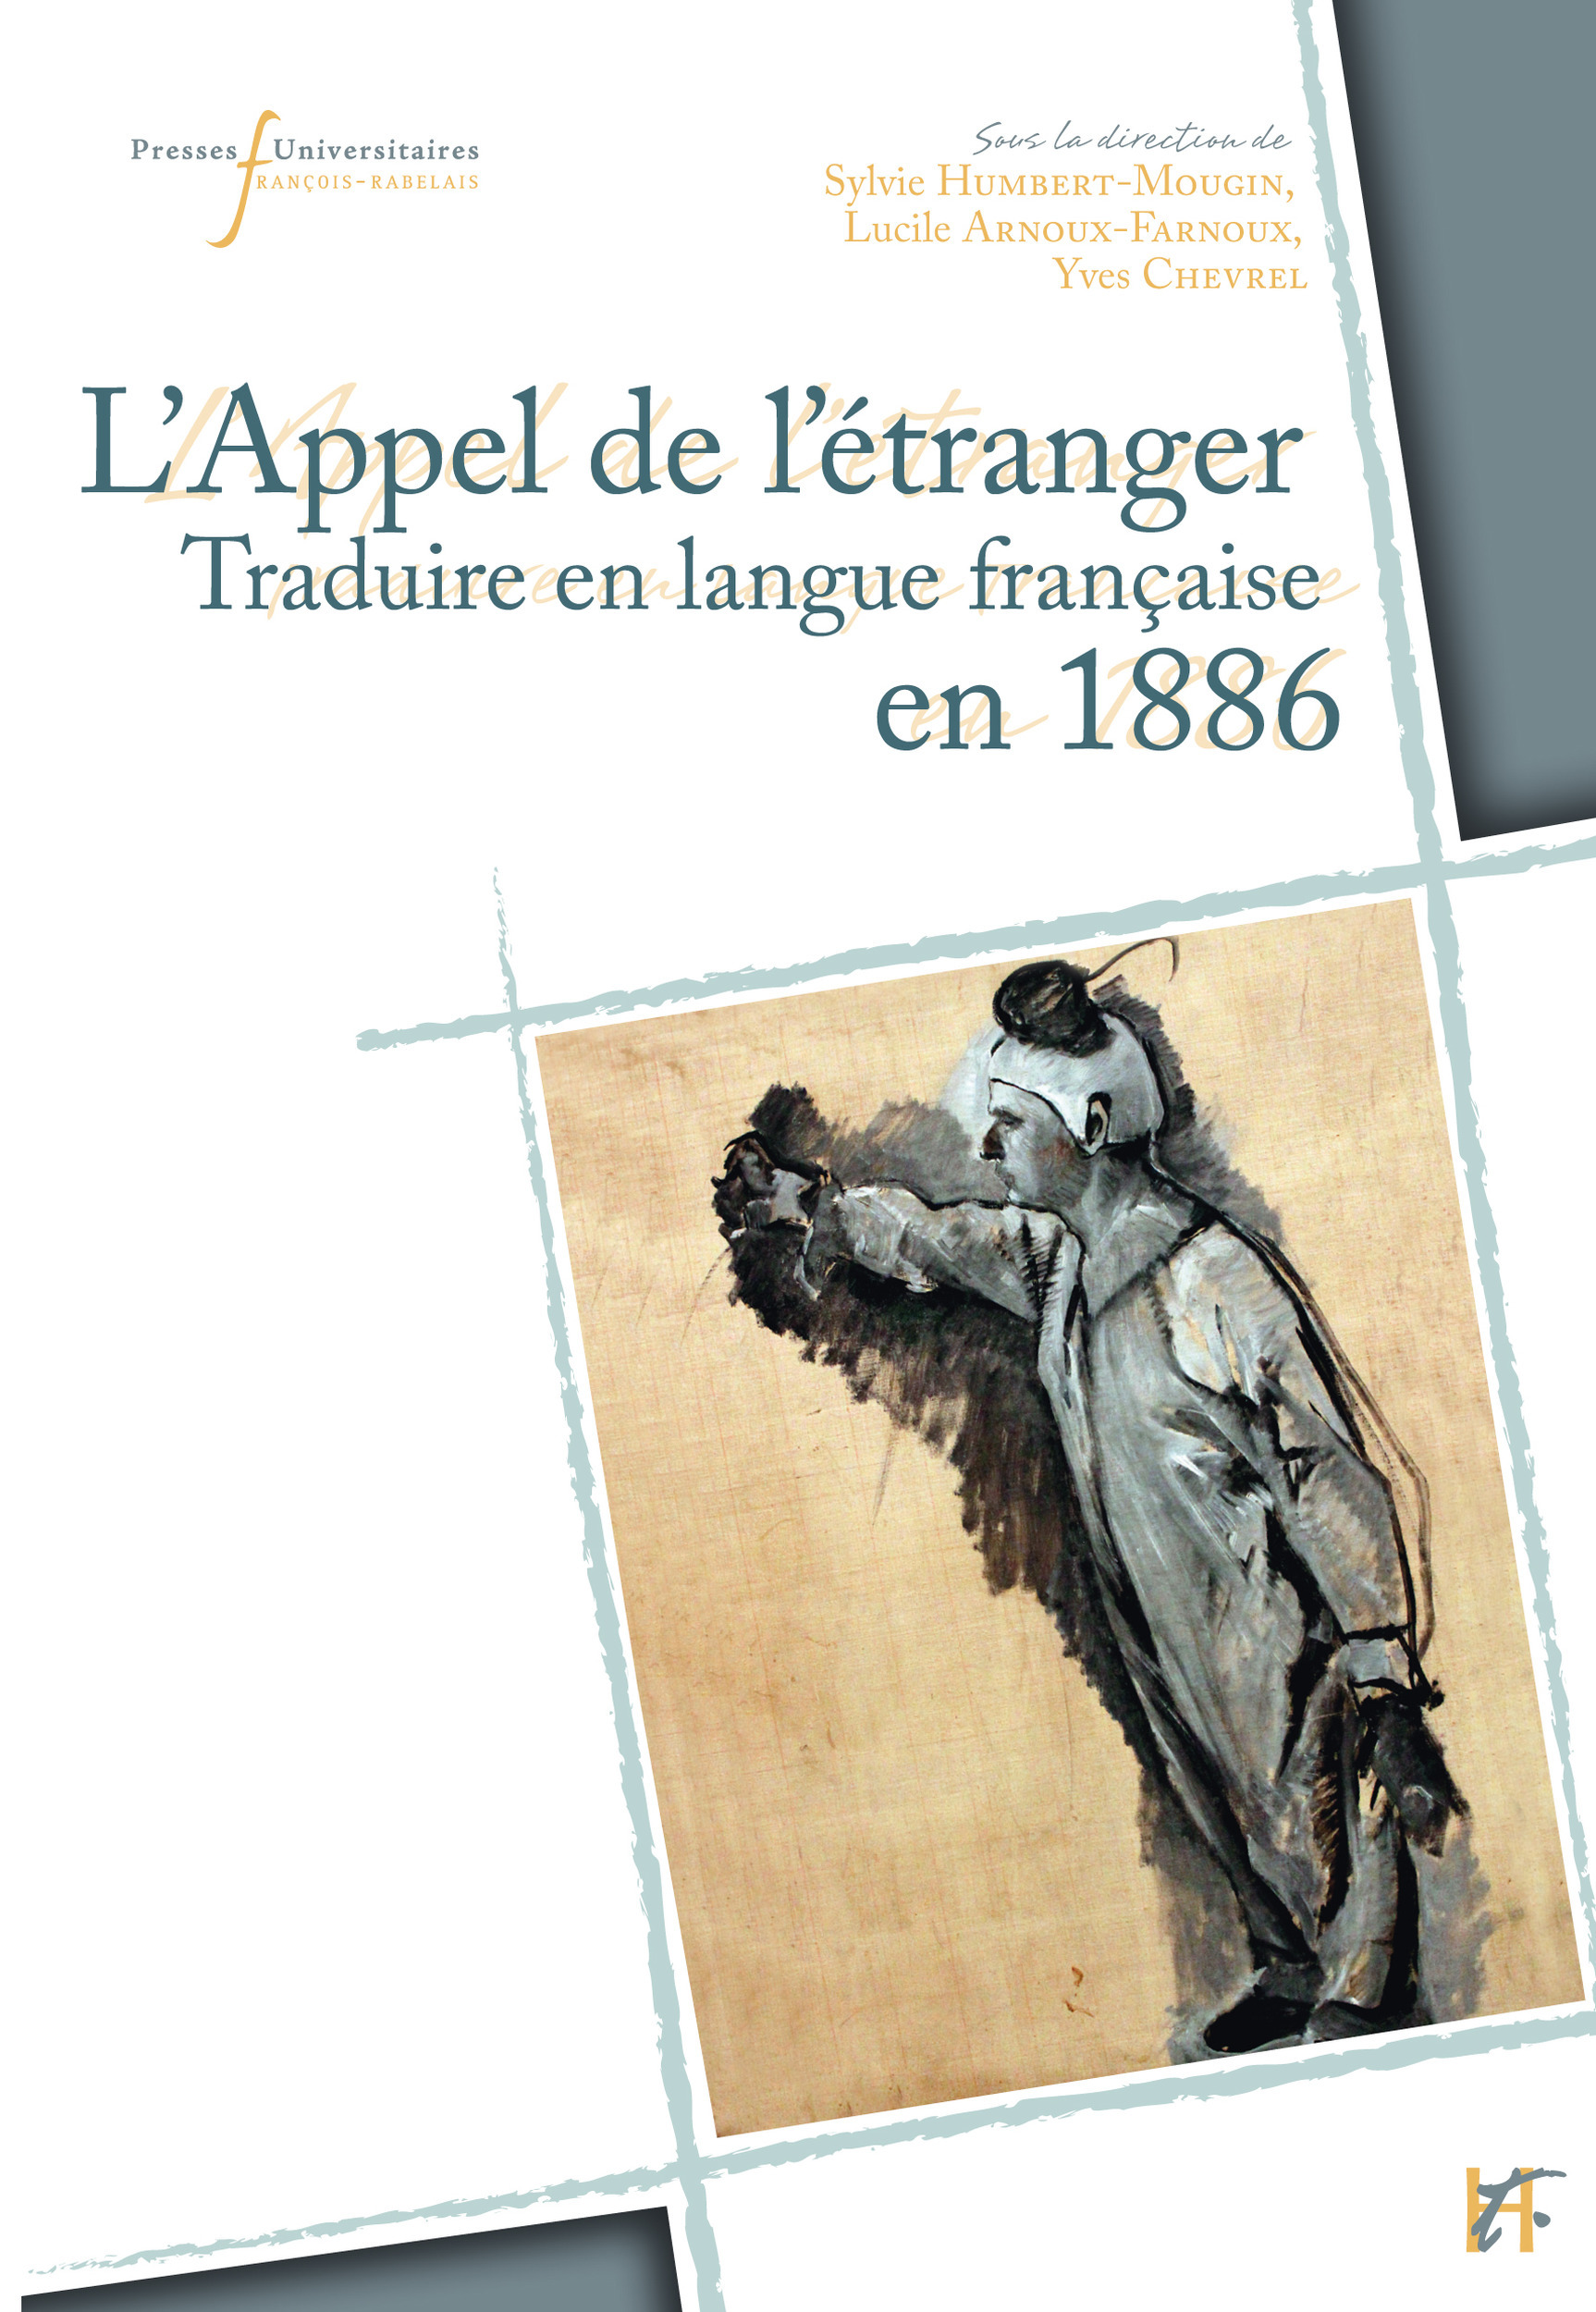 L'appel de l'étranger, traduire en langue française en 1886